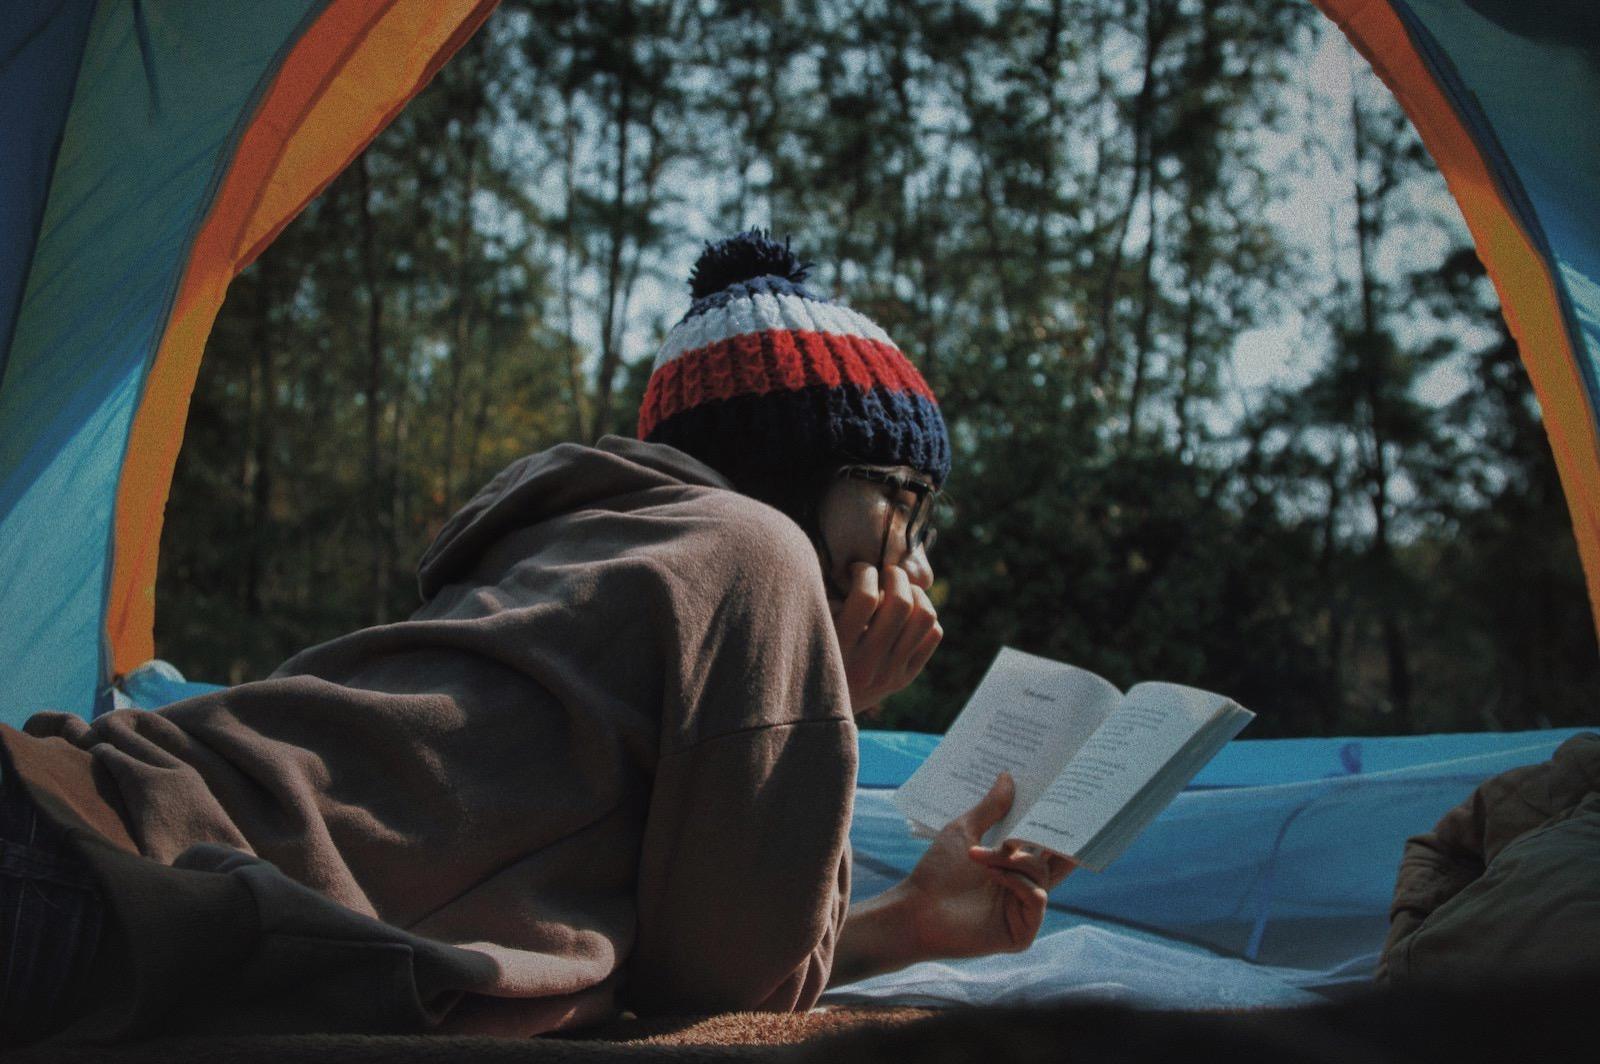 le-tan-640851-unsplash-woman-reading-a-book-in-tent.jpg